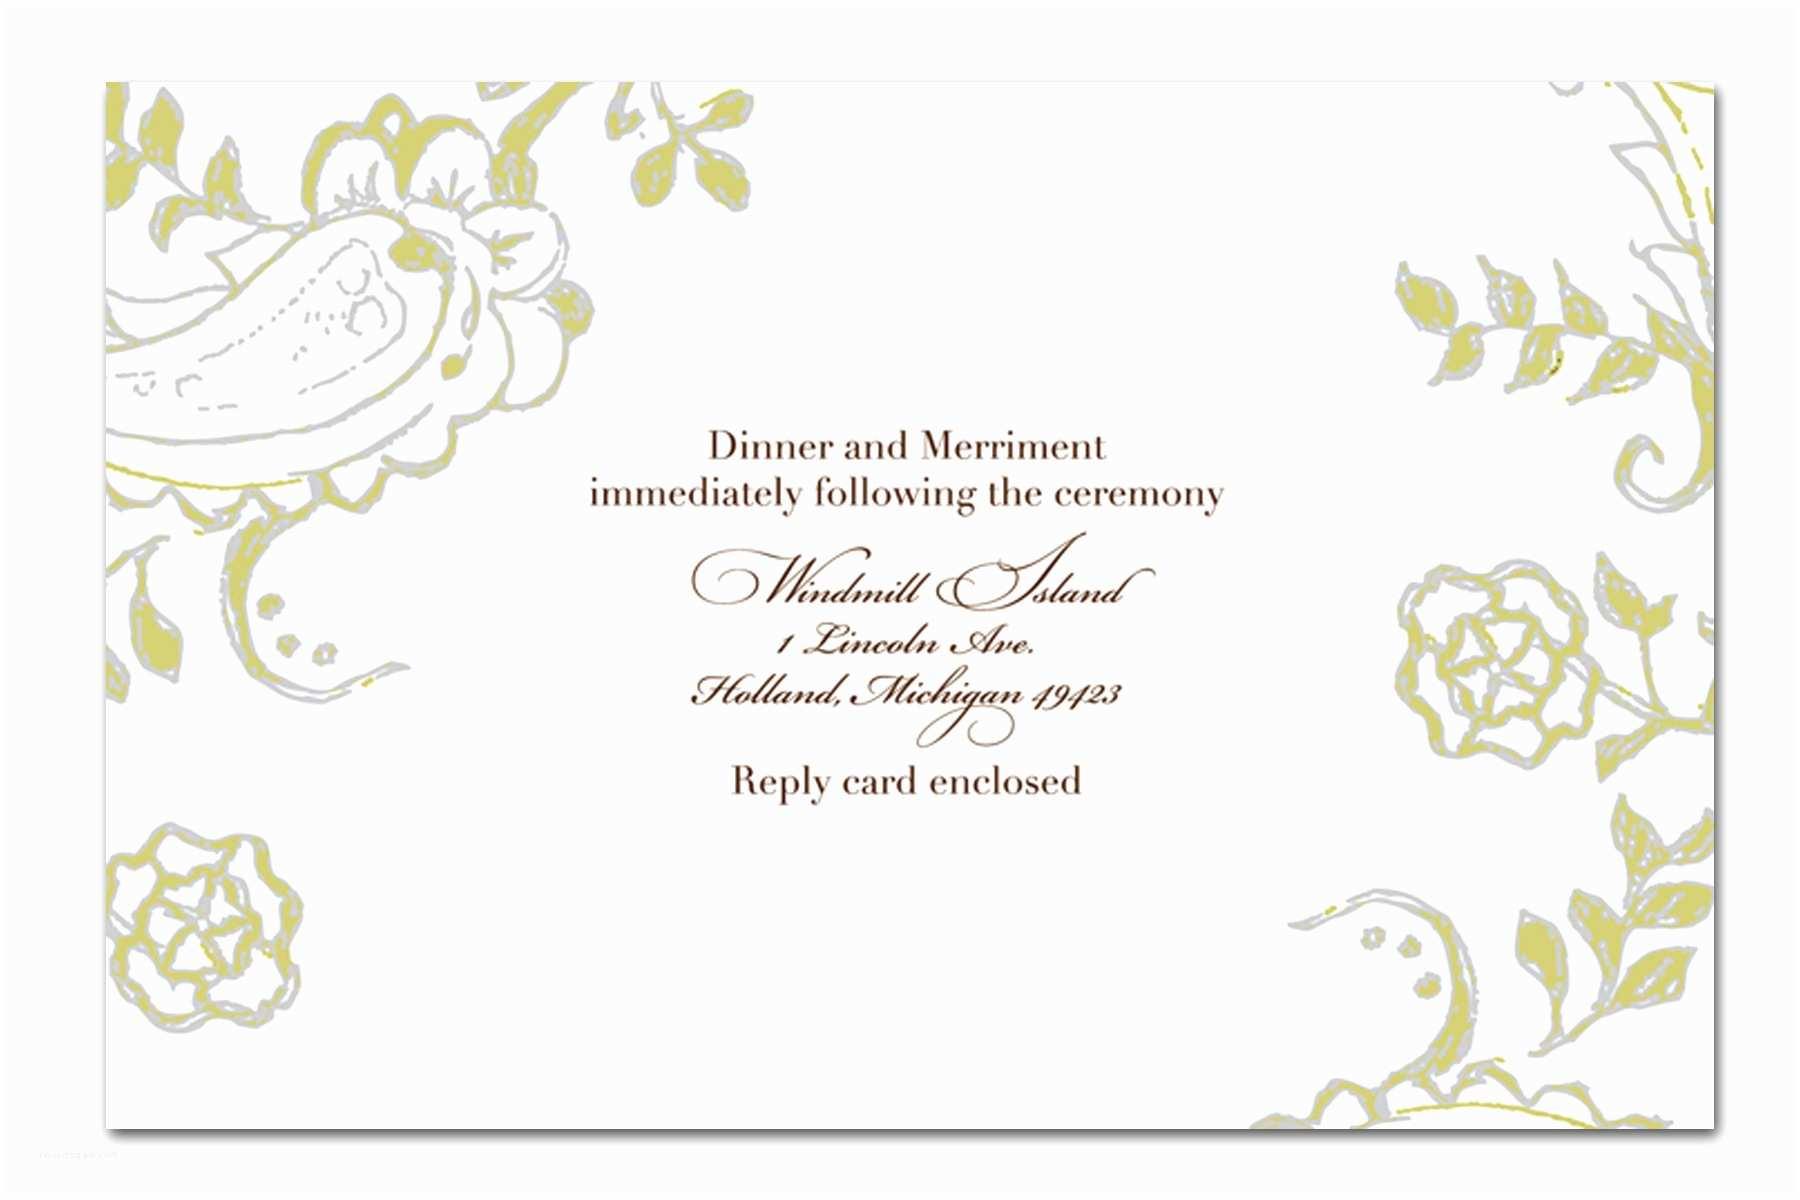 Wedding Invitation Design Images Wedding Invitation Design Templates